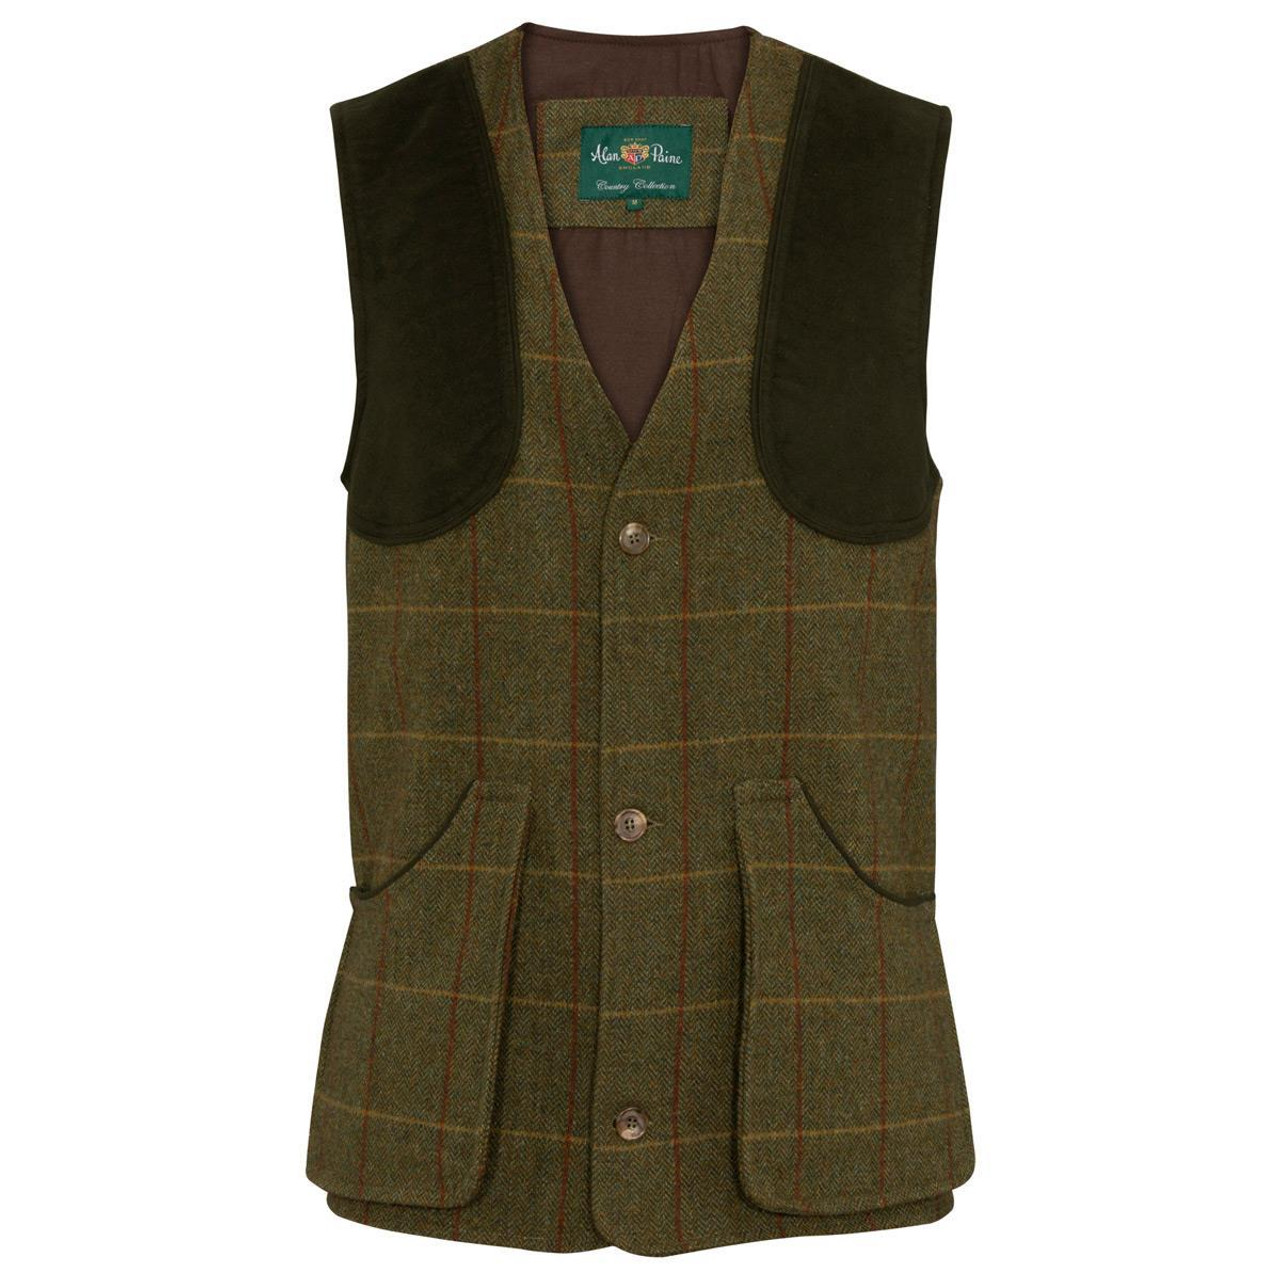 Oak Alan Paine Mens Rutland Shooting Waistcoat